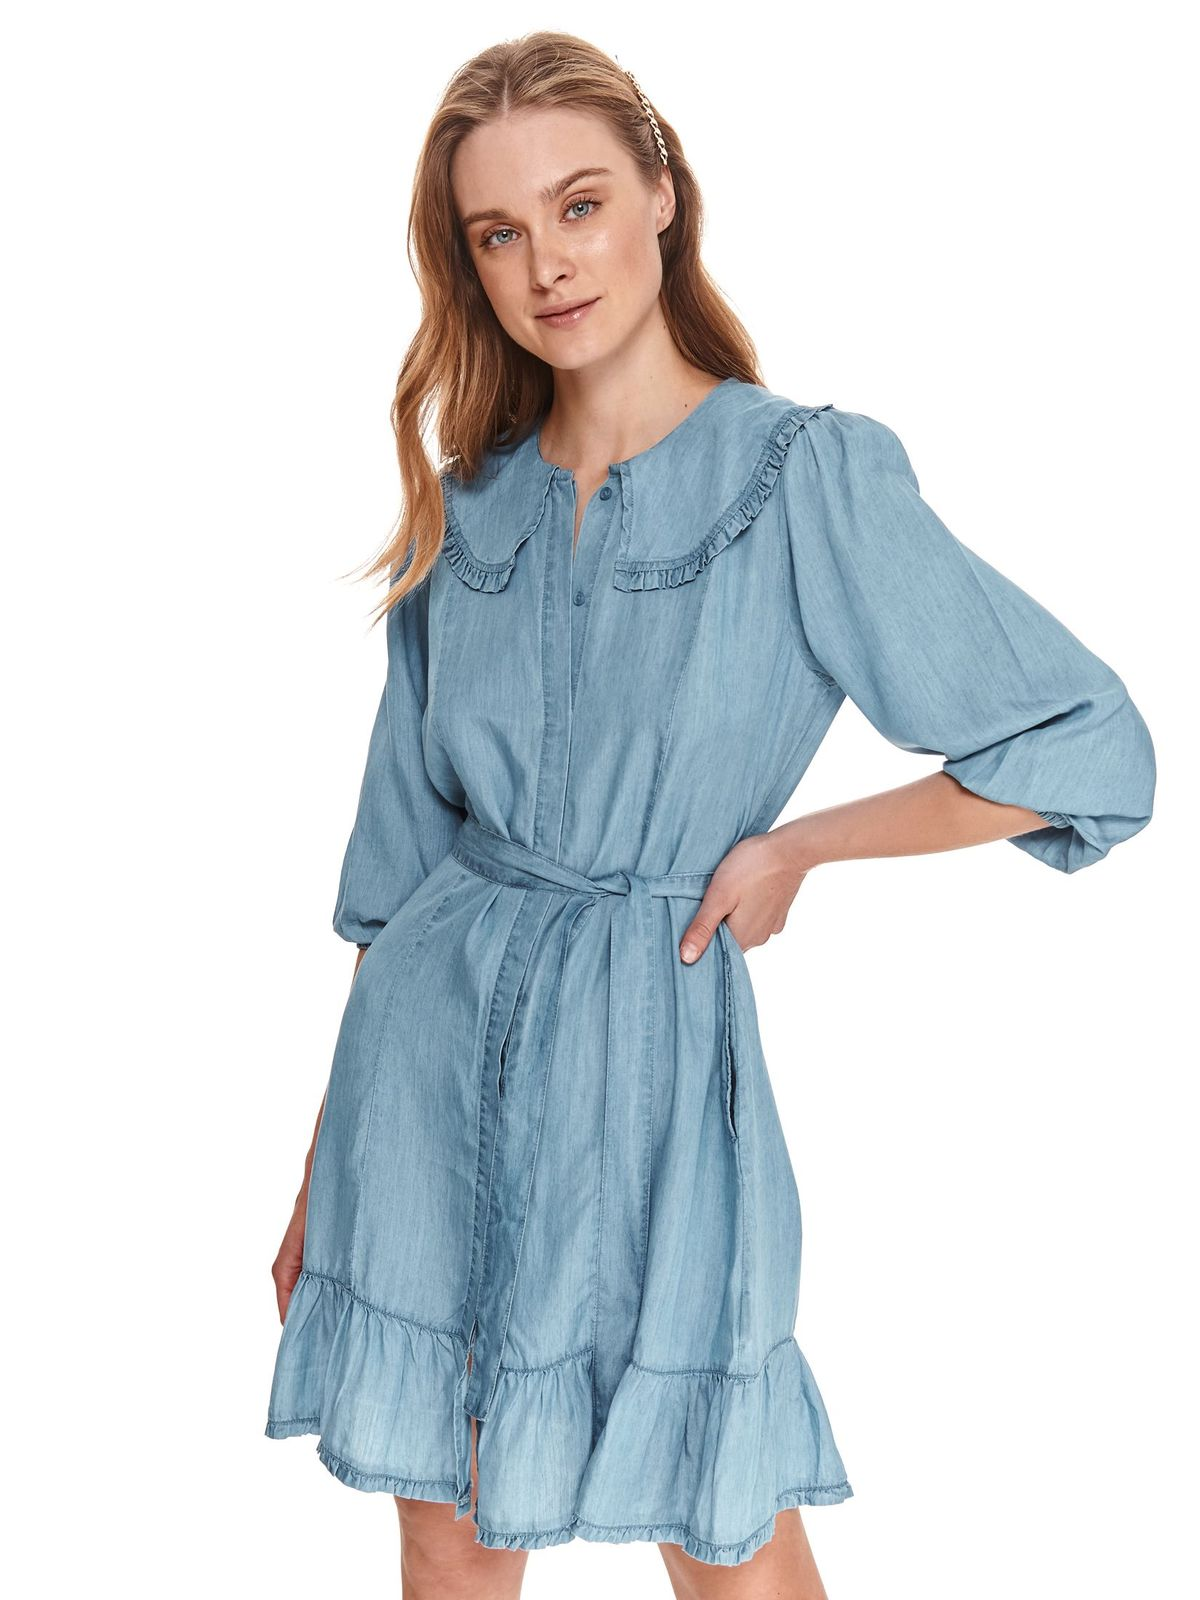 Lightblue dress short cut straight with ruffle details